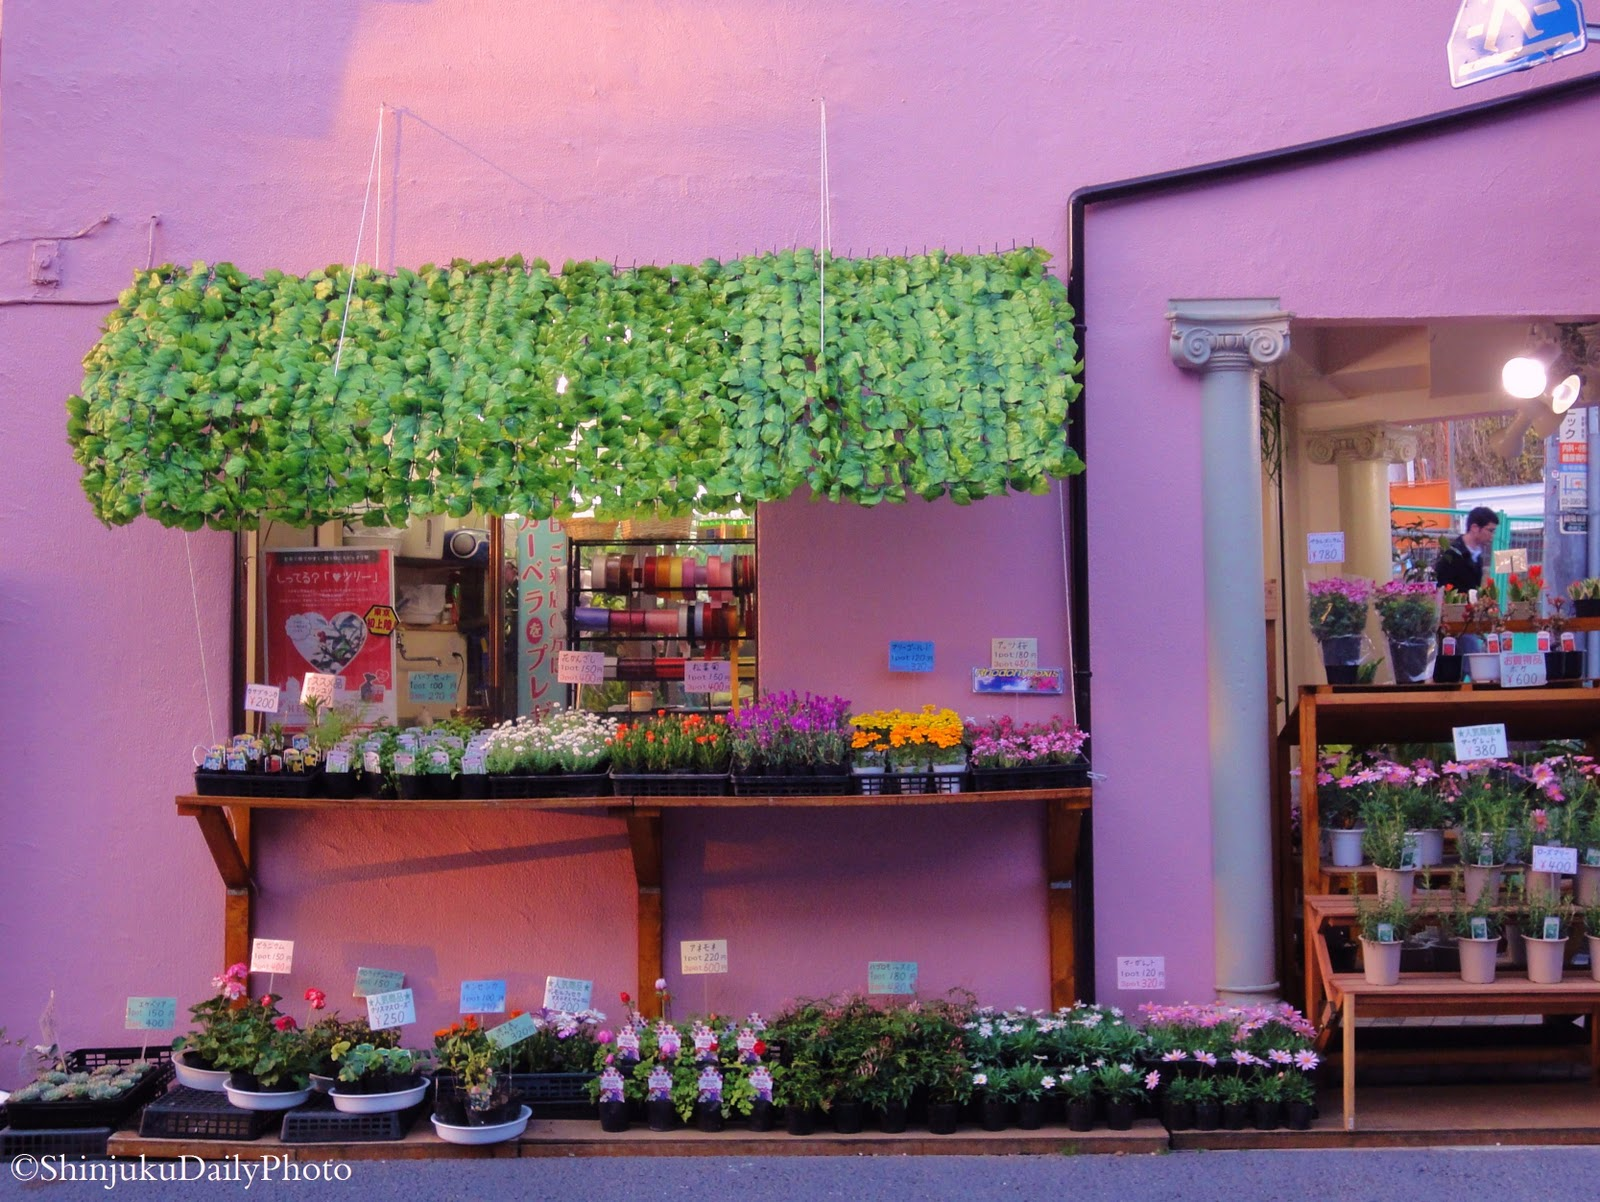 Shinjuku Daily Photo The Flower Shop